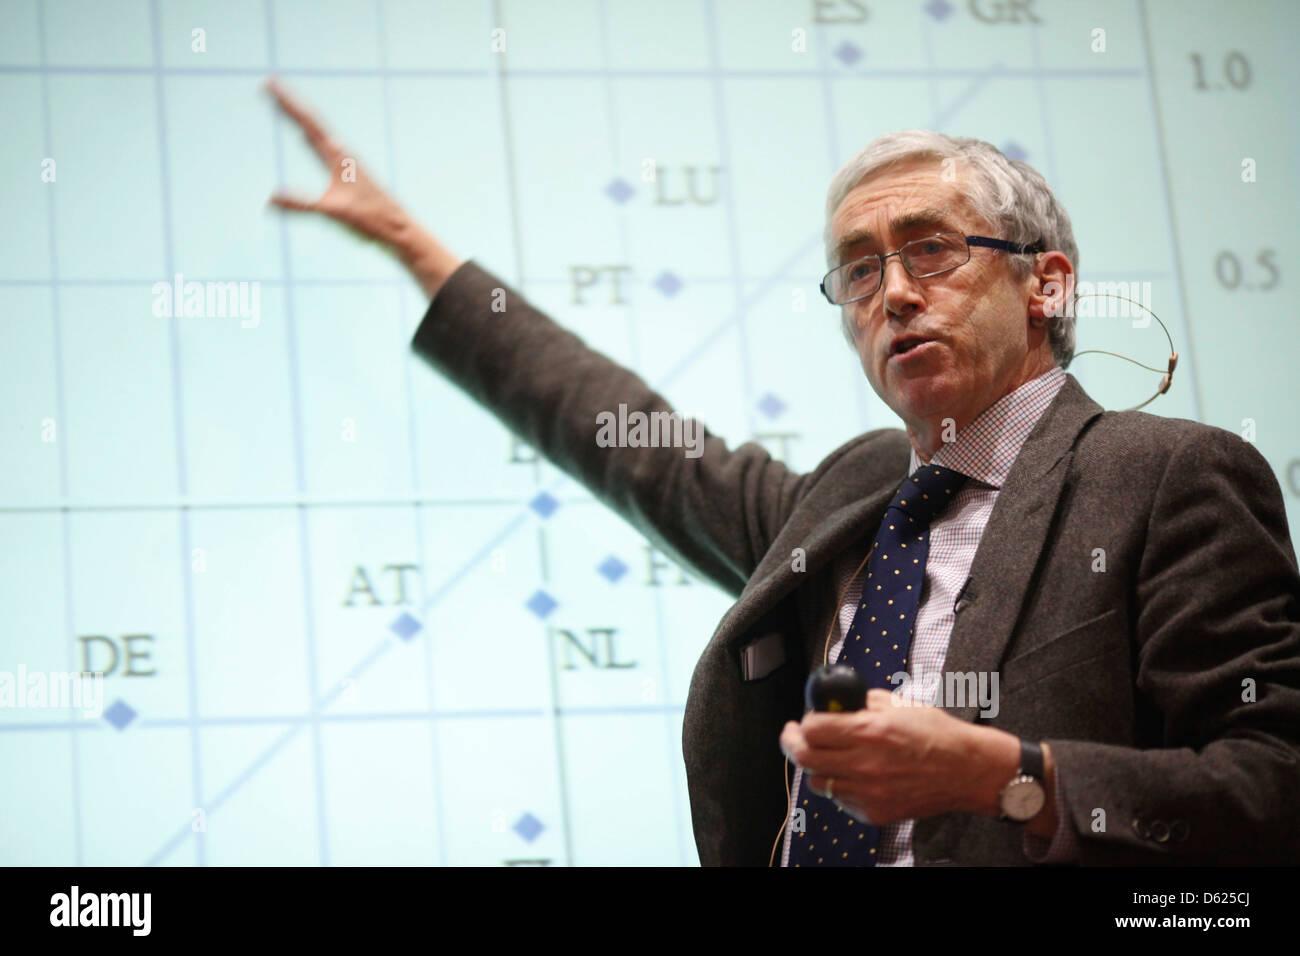 Professor Paul De Grauwe delivers a speech at LSE - Stock Image